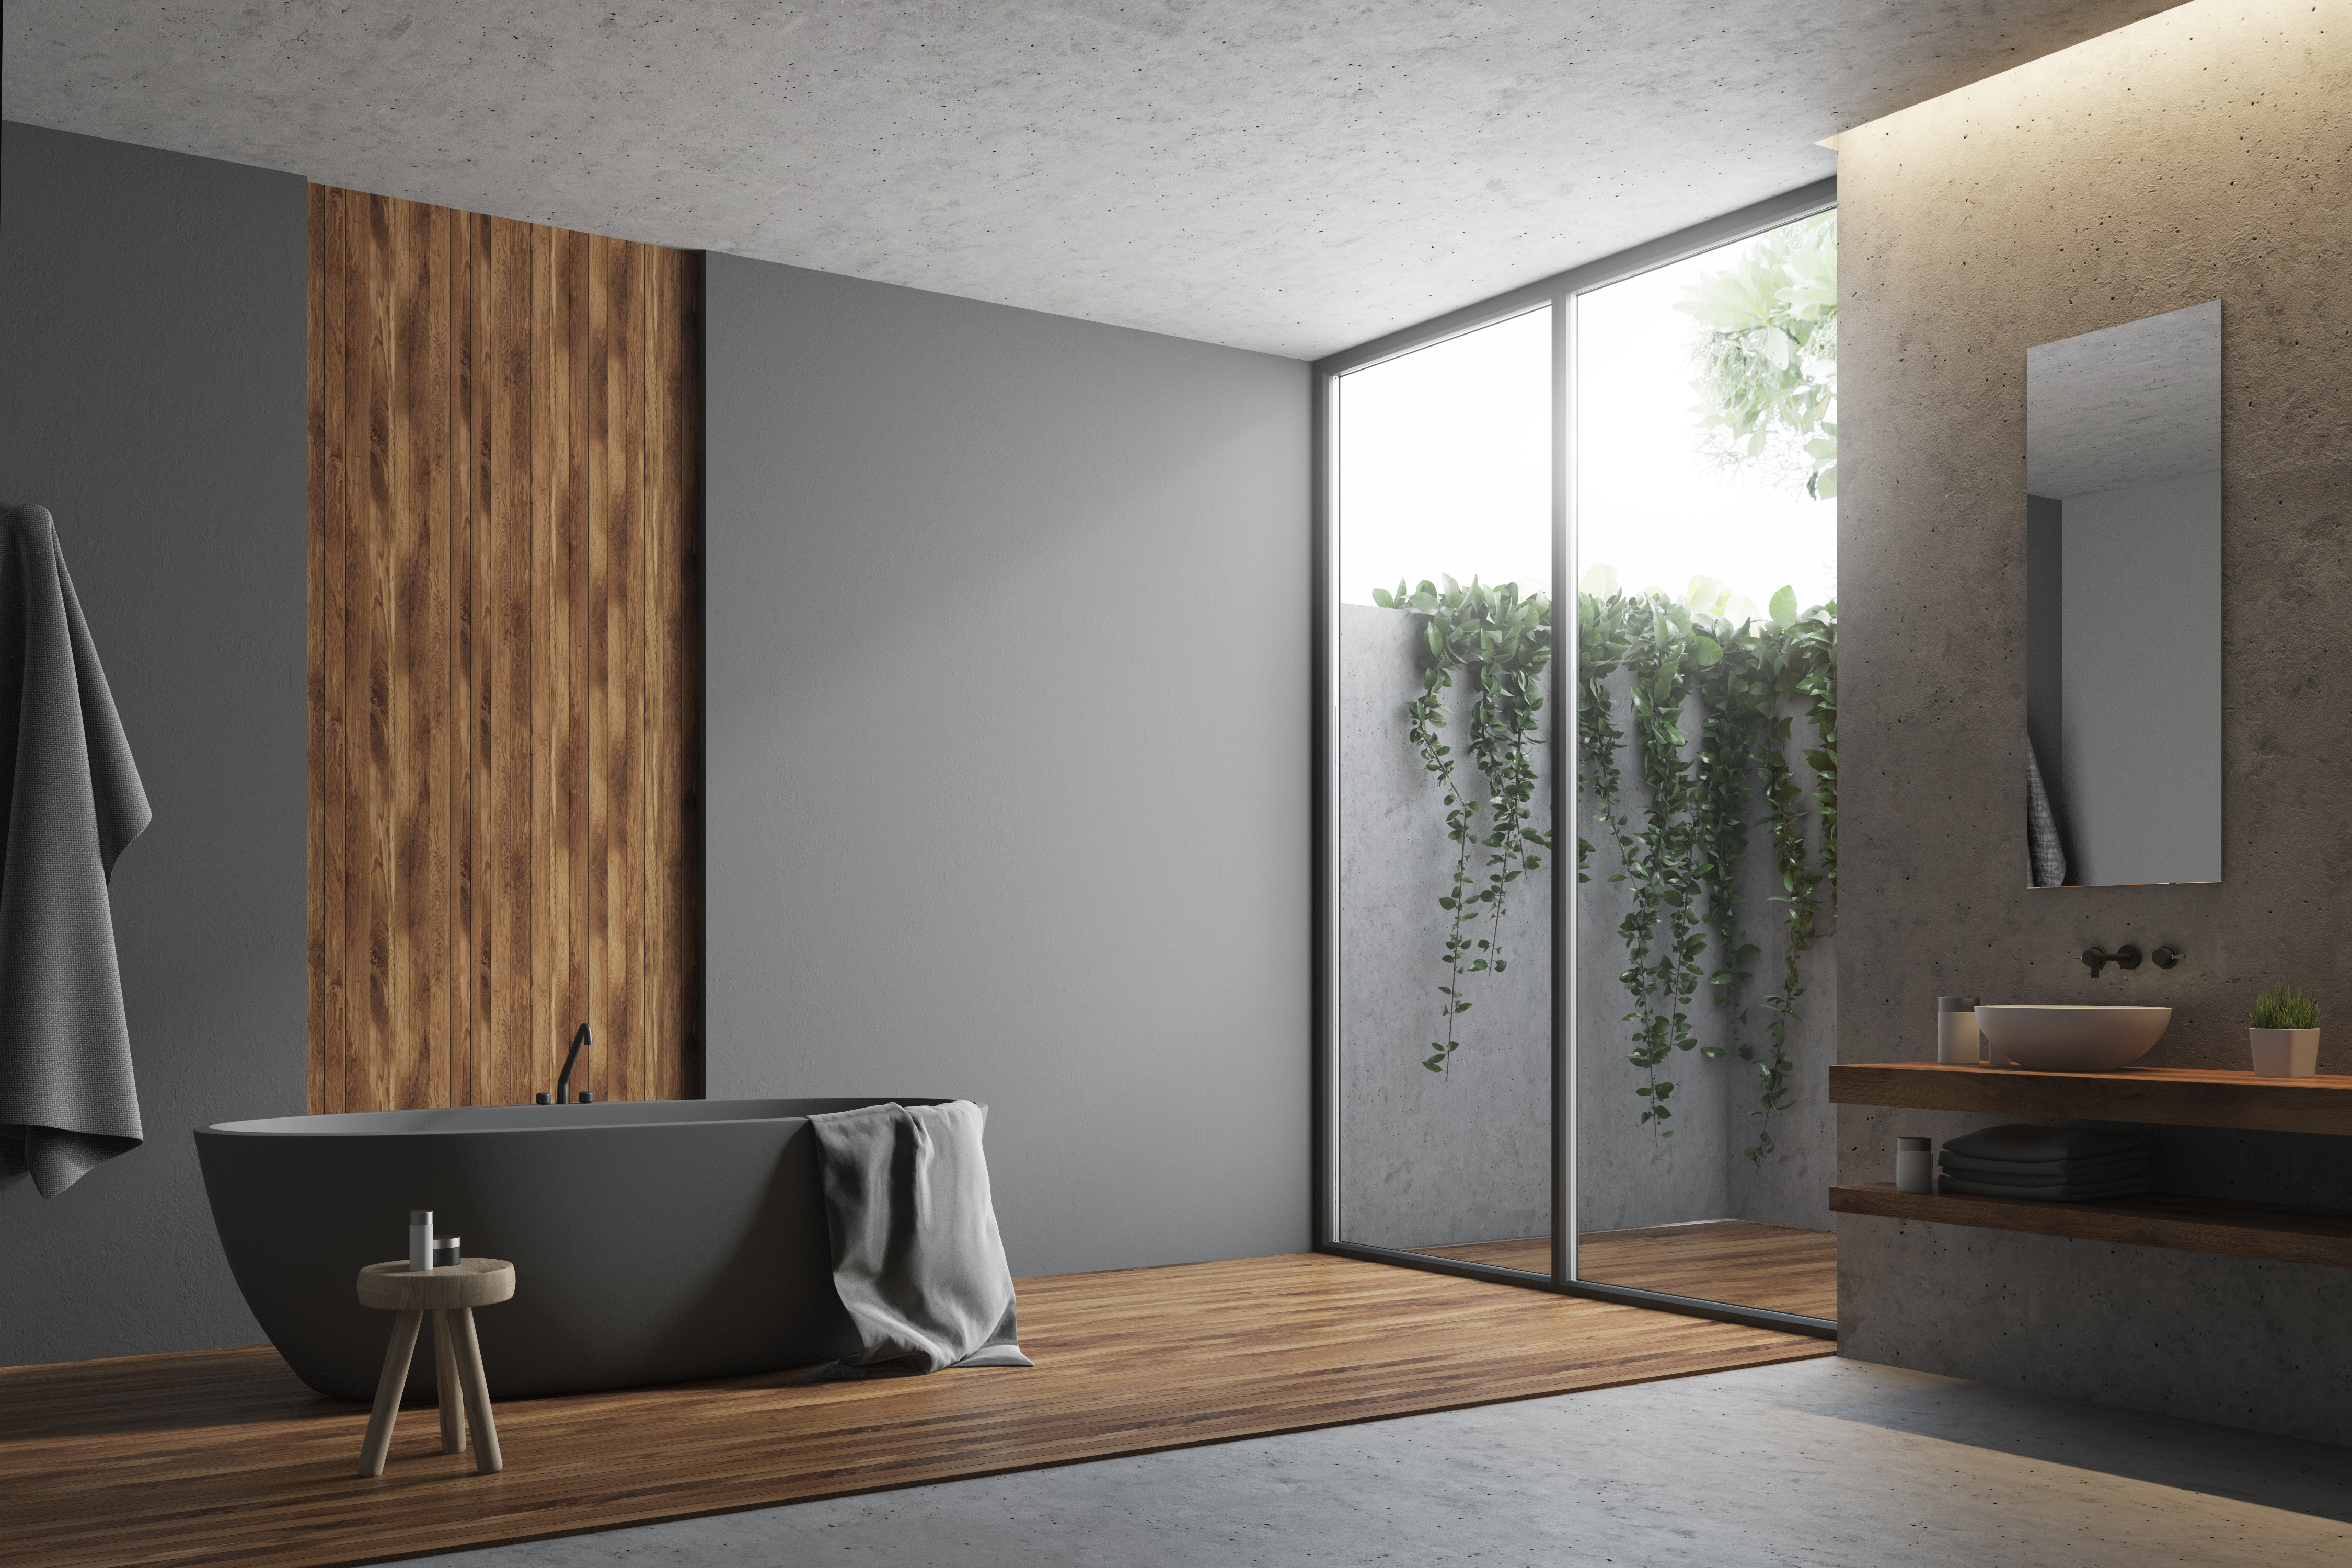 Gray and wooden bathroom corner